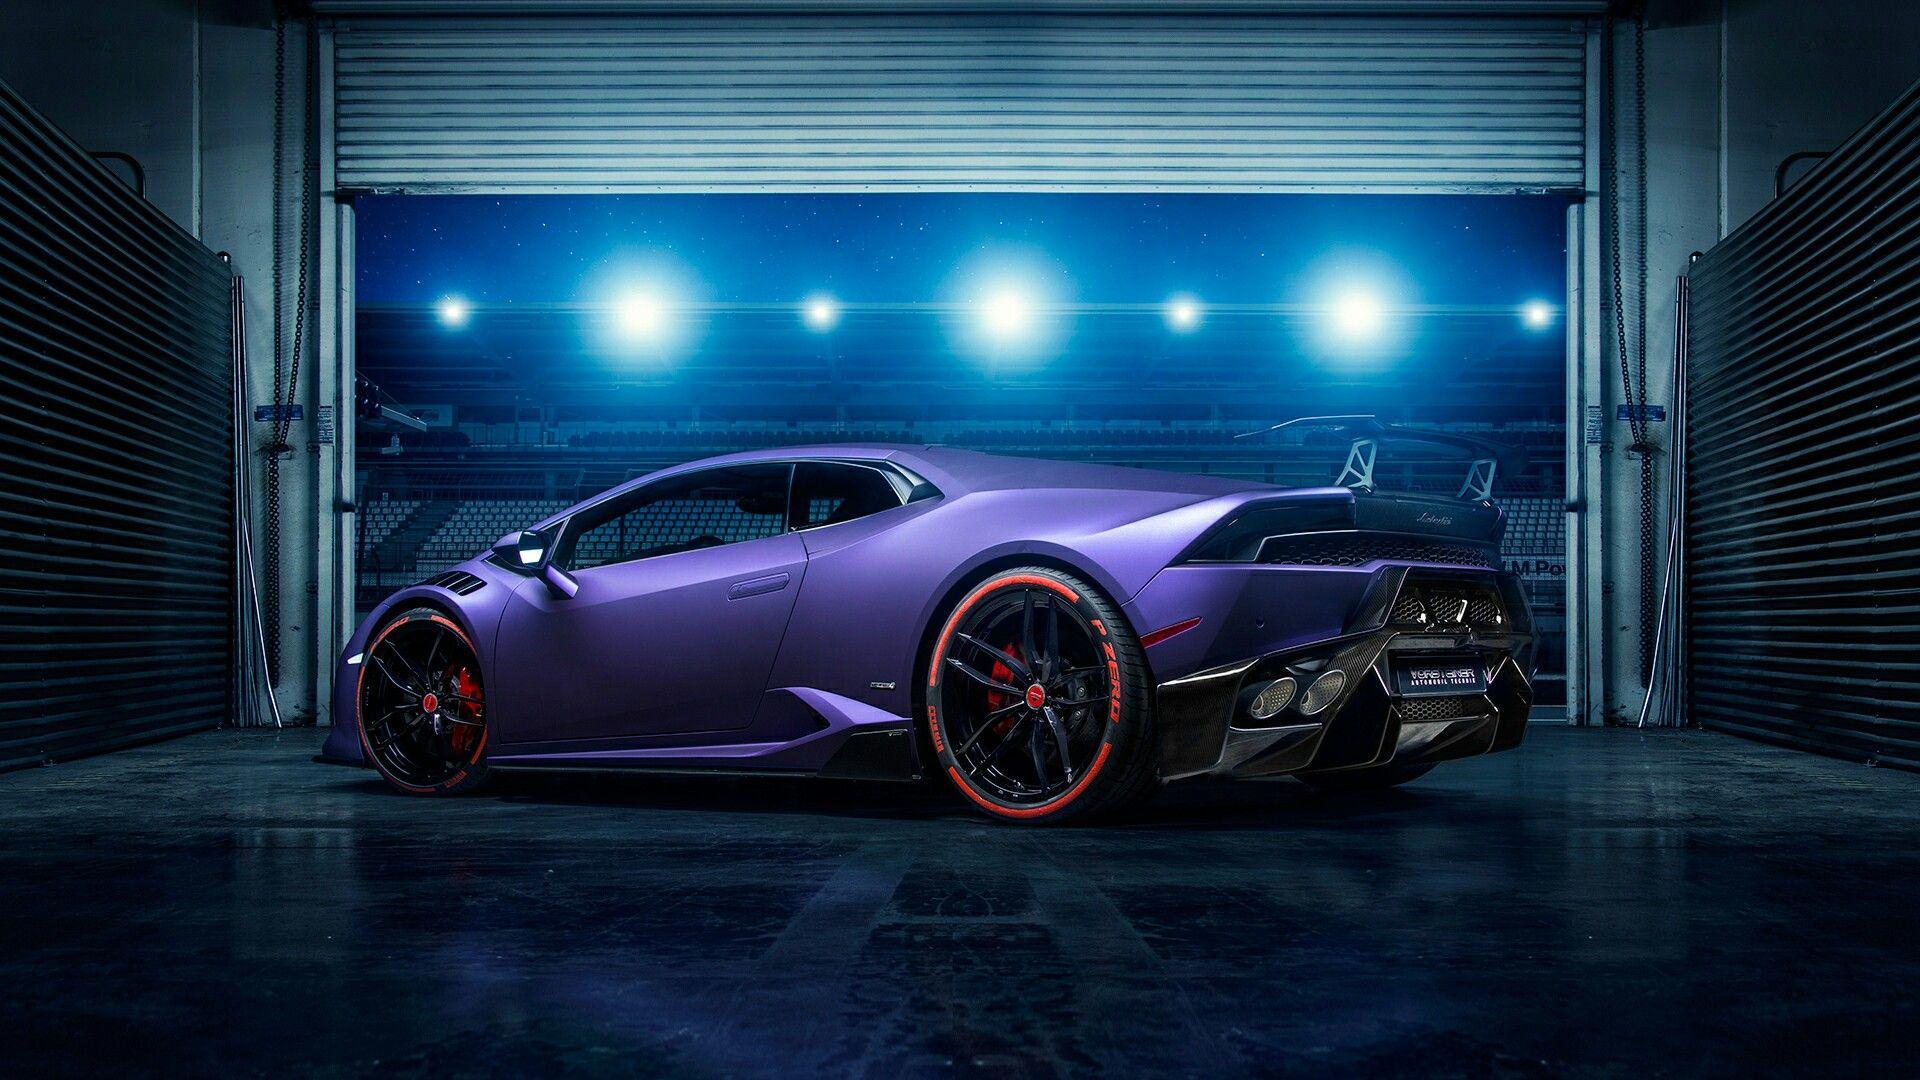 Lamborghini Huracan Wallpaper Android